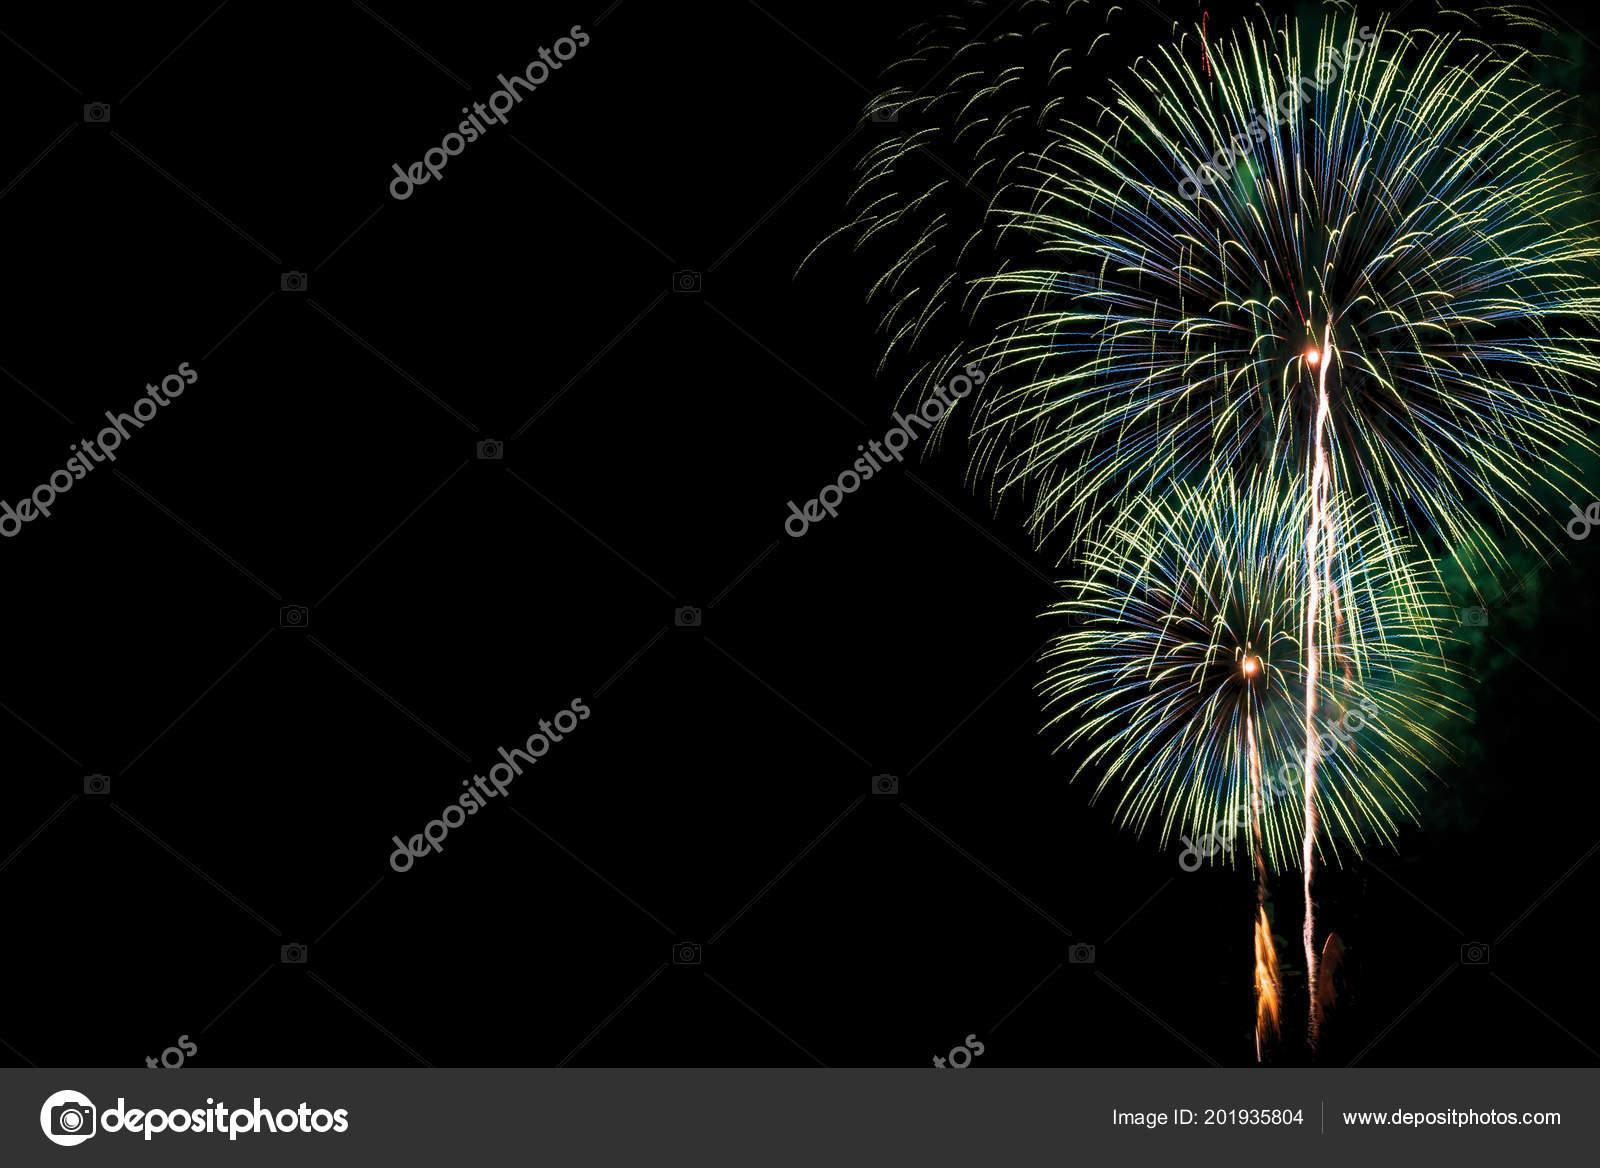 Rainbow Fireworks Celebration Colorful Abstract Image With: Abstract Beautiful Colorful Fireworks Display Celebration